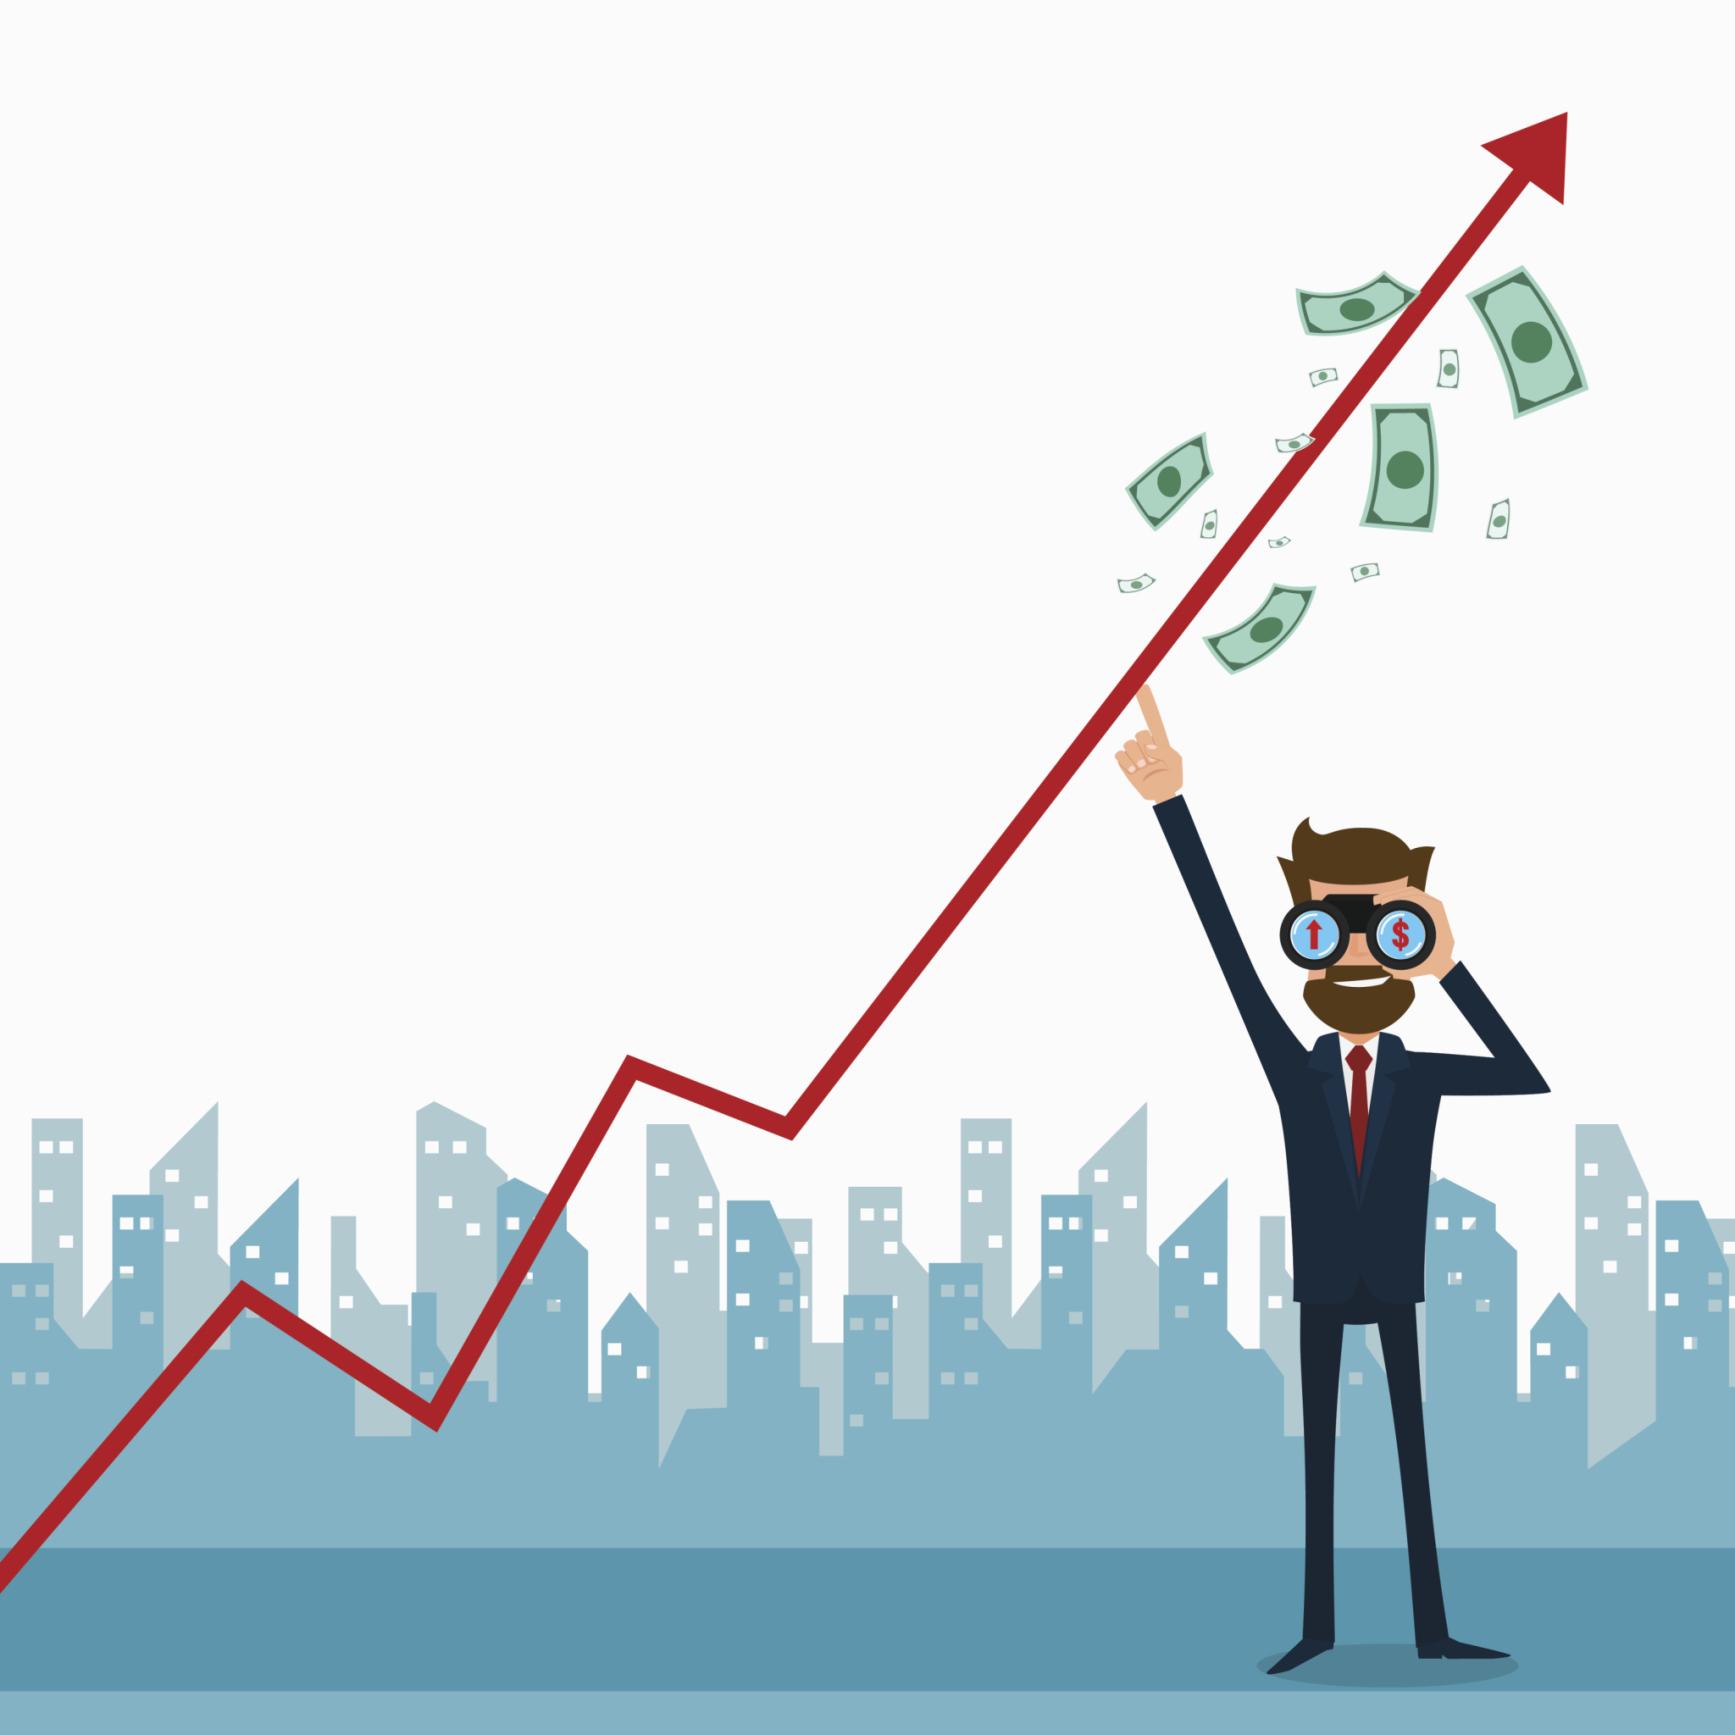 Cartoon figure with binoculars looking at stock chart.